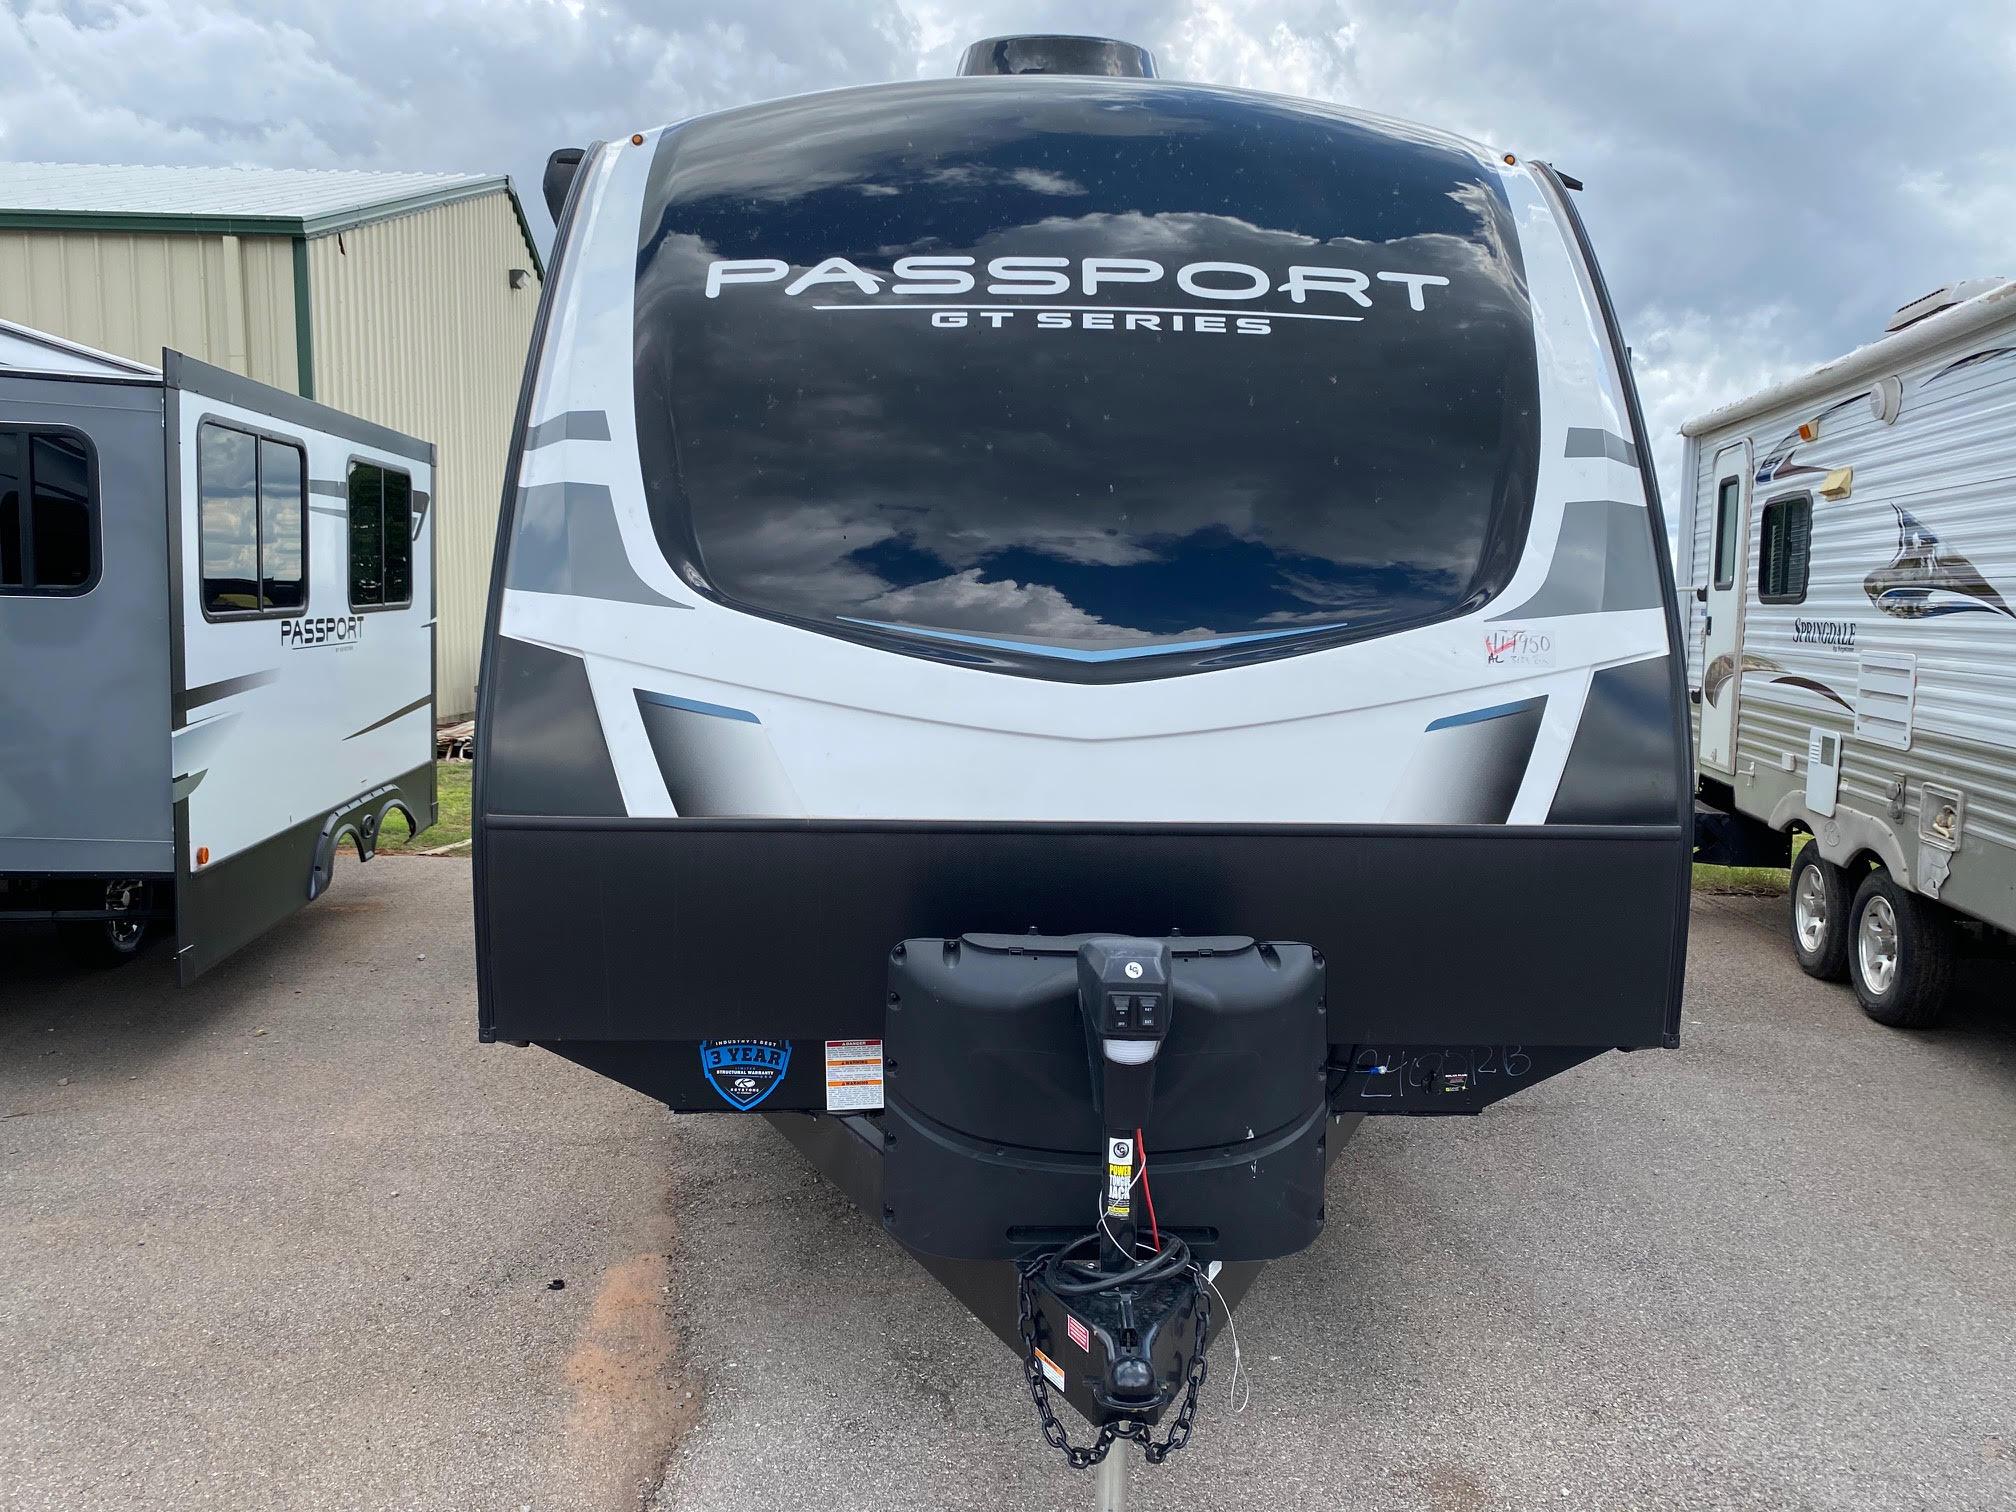 2021 Passport GT Series 2400RB